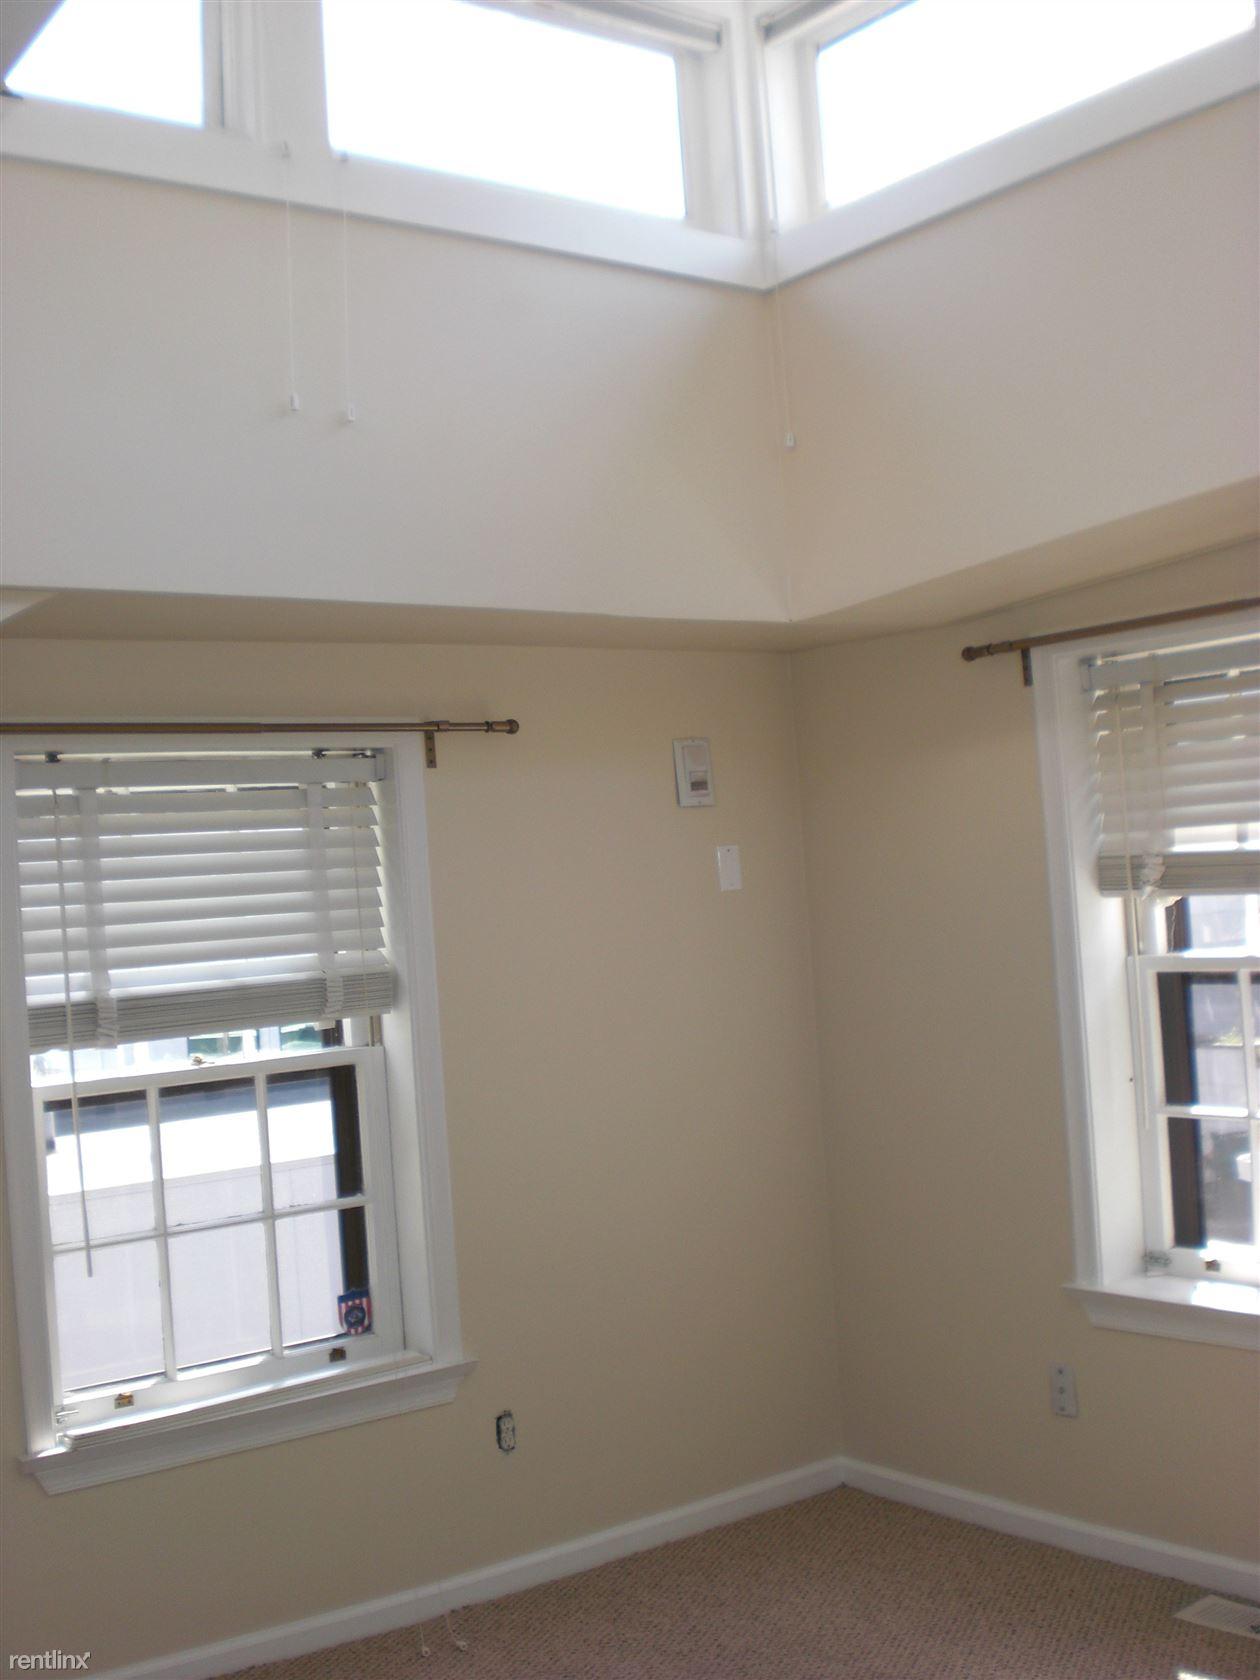 3408 Sansom St, Philadelphia, PA - $3,200 USD/ month